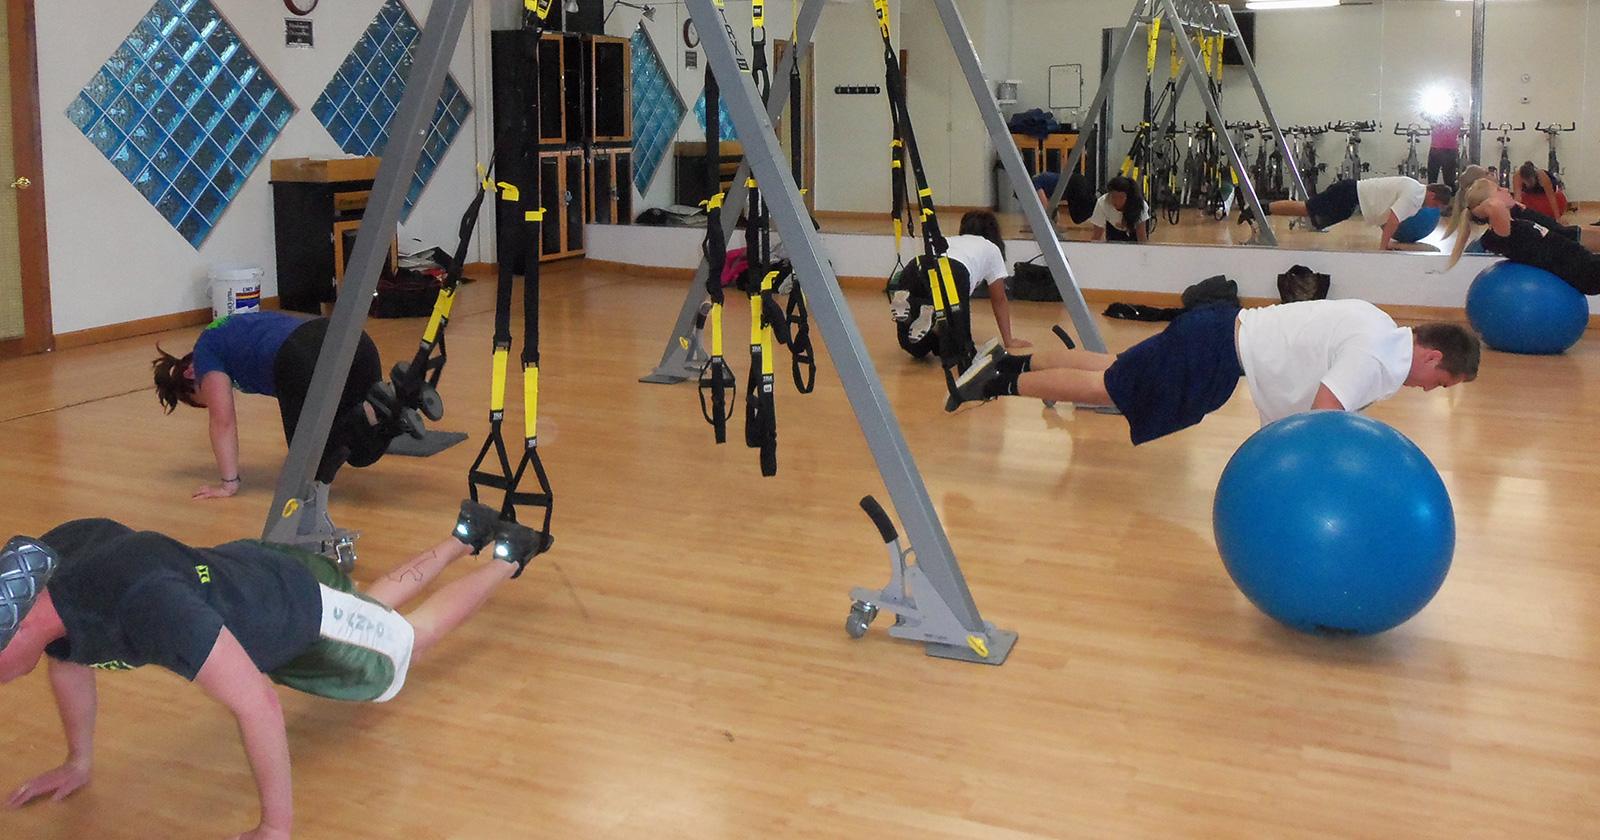 Flagstaff Health Club   Fitness & Wellness Facility in Arizona